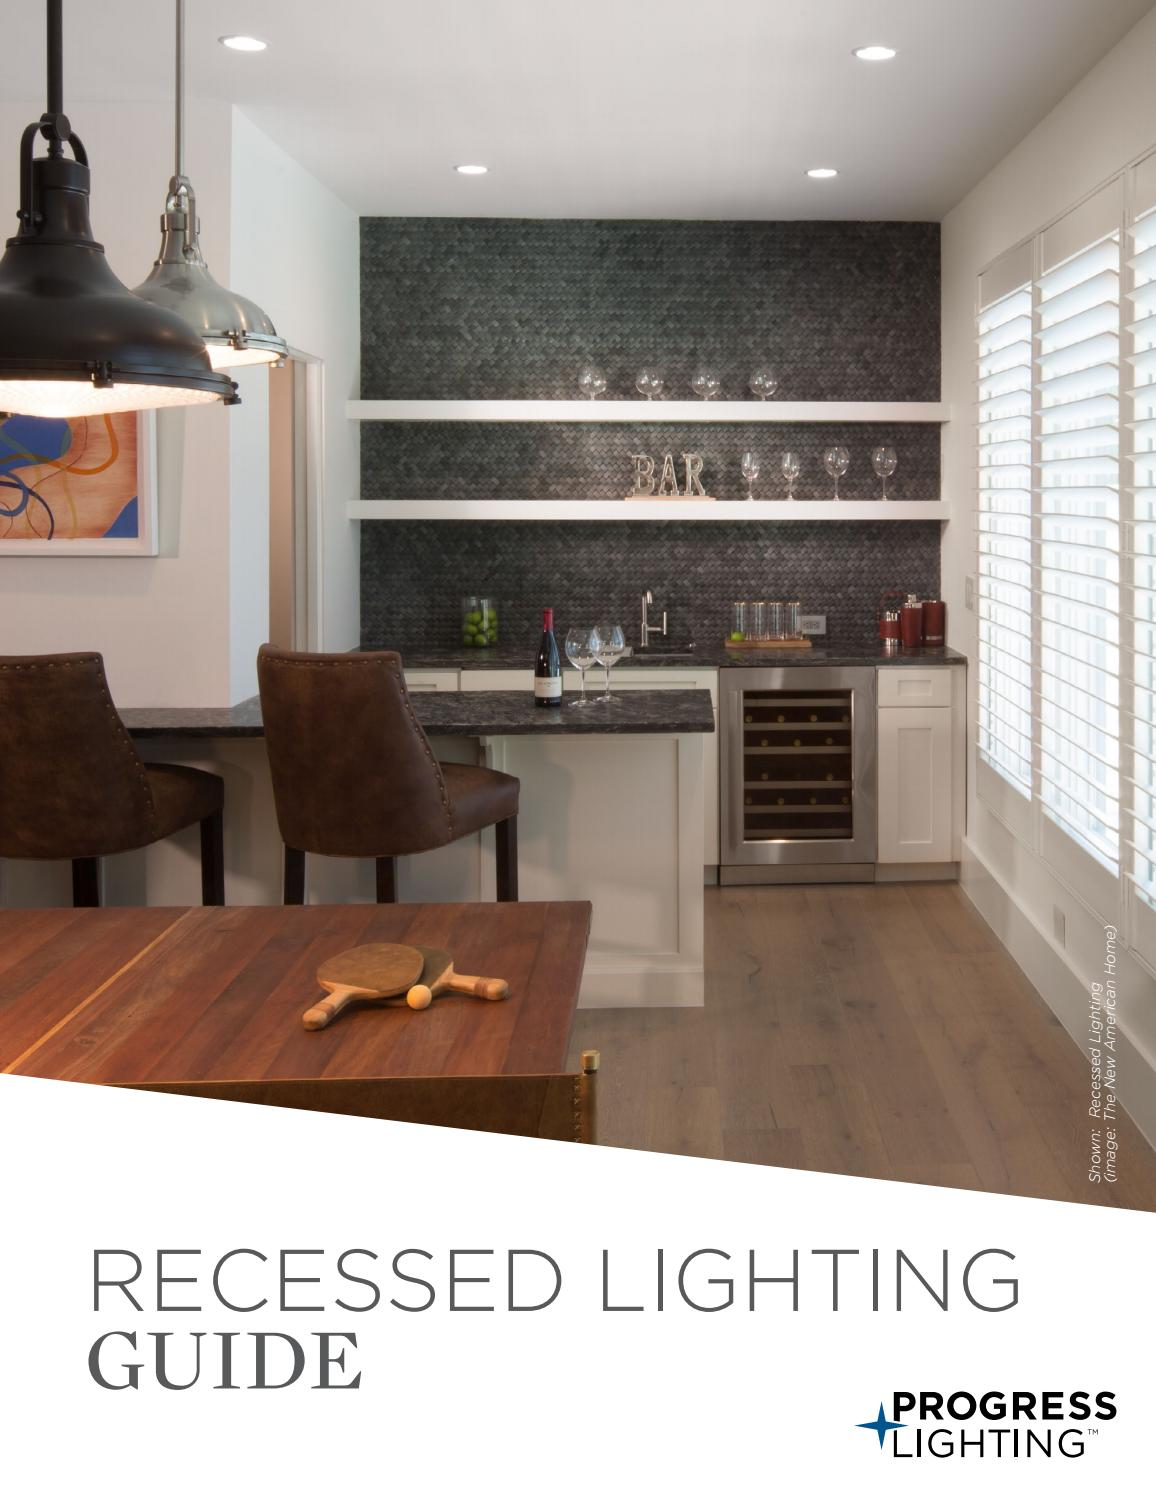 Progress Lighitng Recessed Lighting